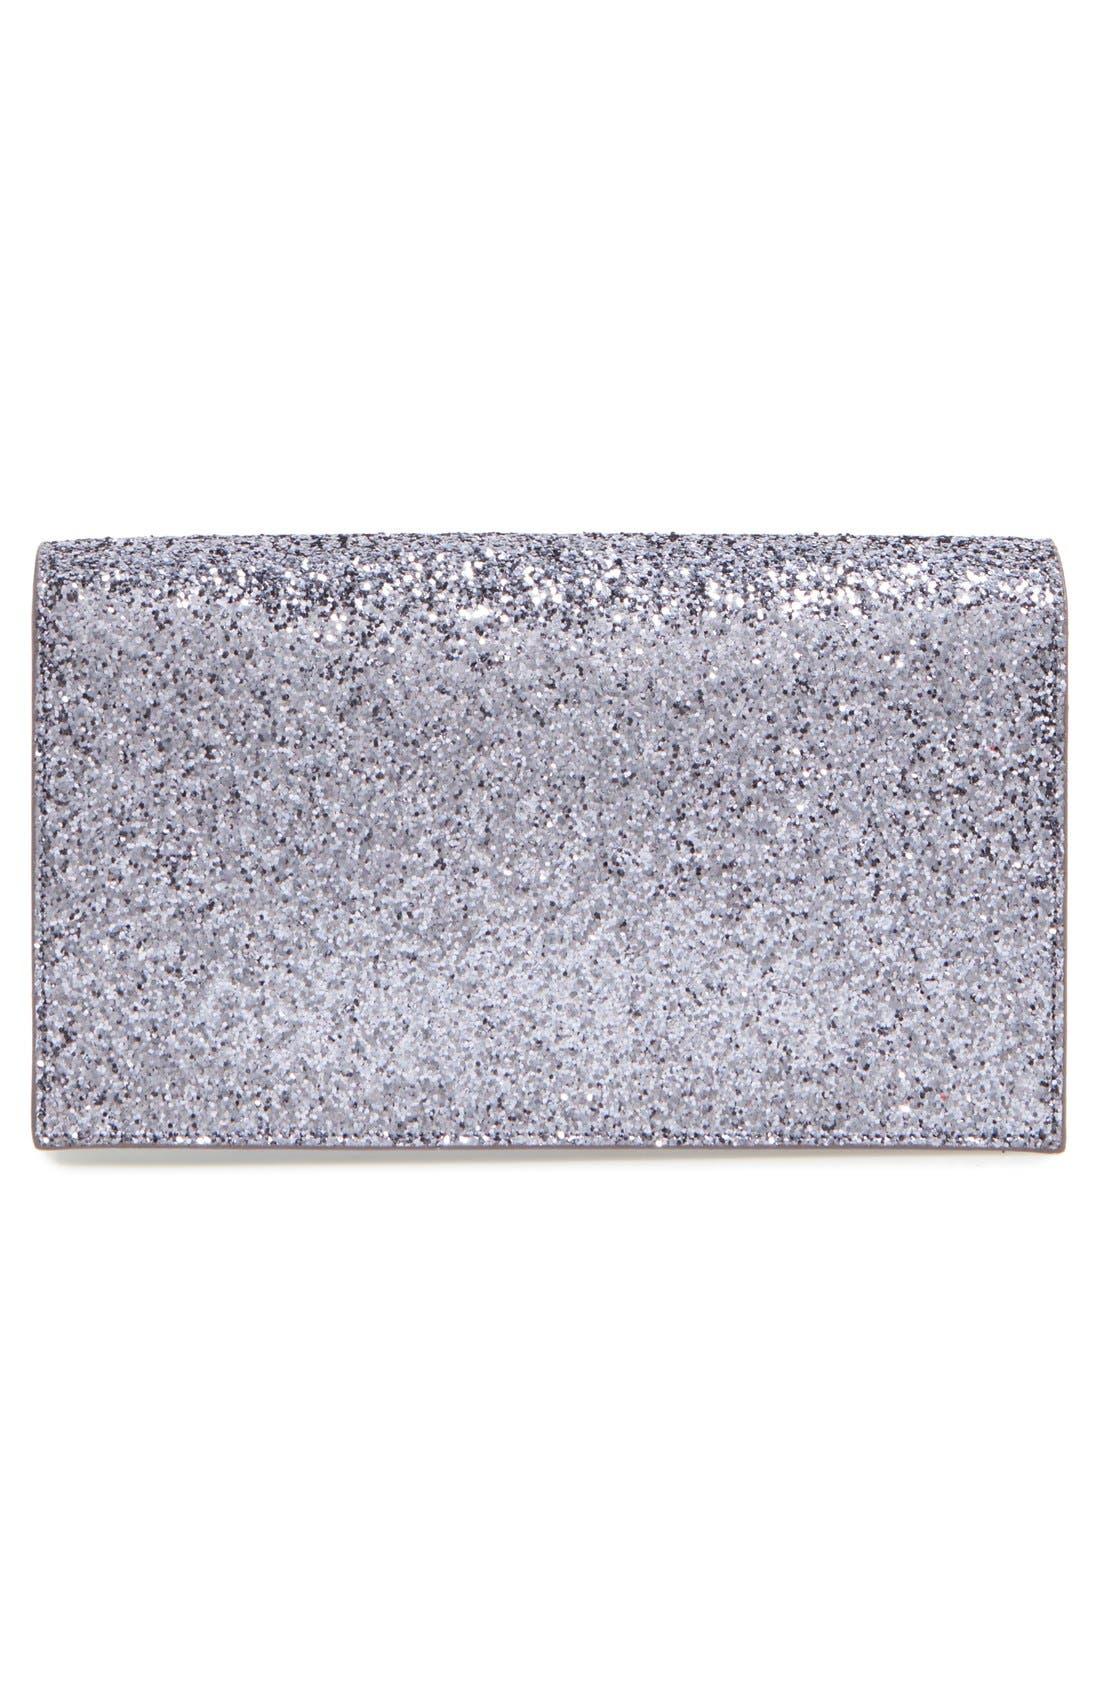 Alternate Image 3  - Saint Laurent 'Monogram Kate' Glitter Clutch